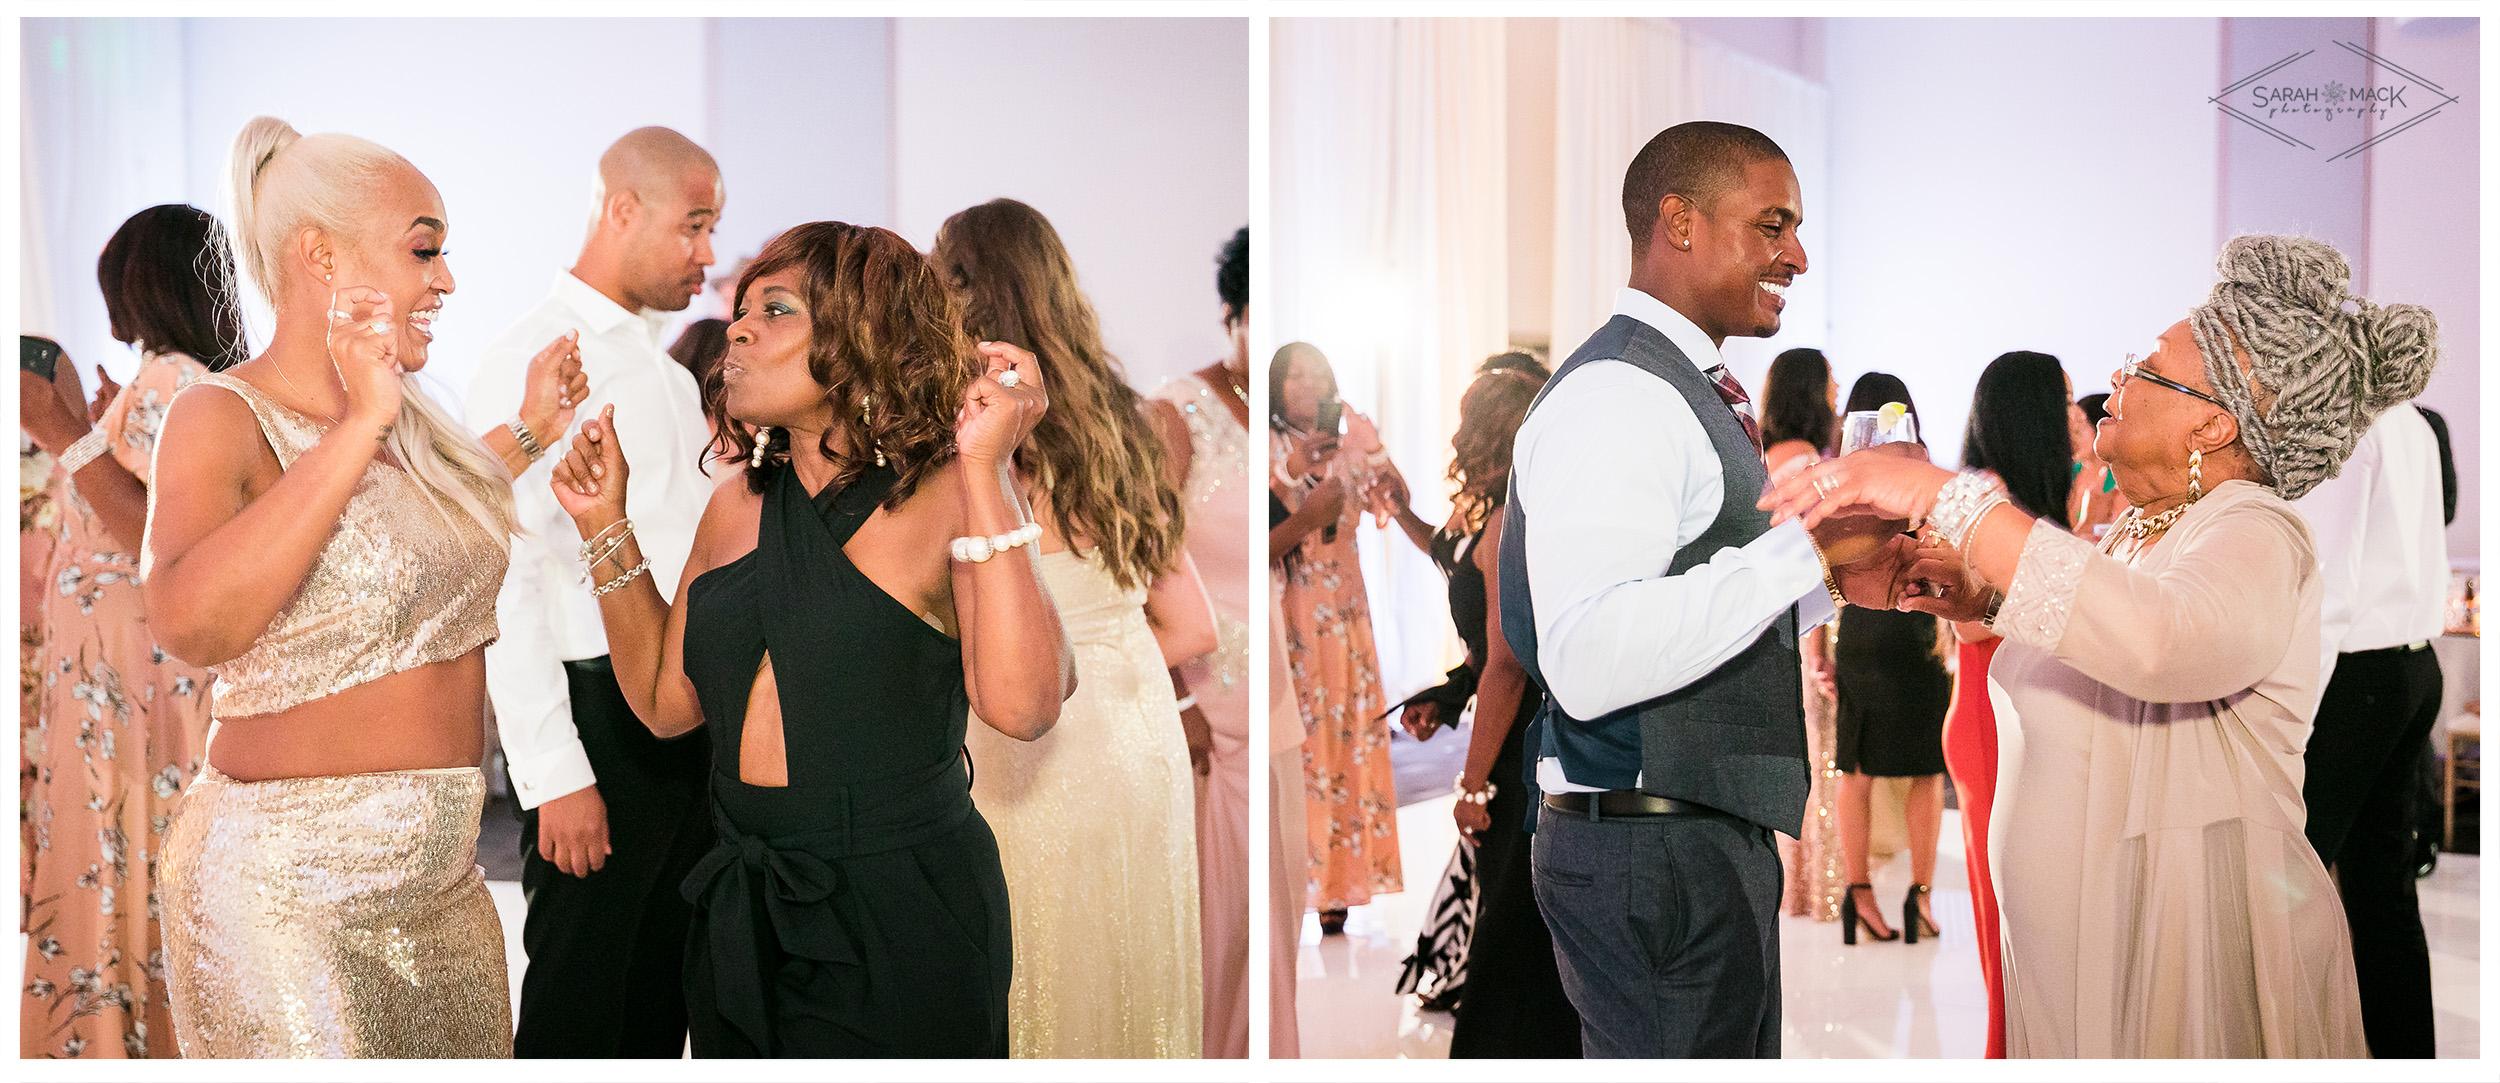 MK-Santa-Monica-Catholic-Church-Wedding-Photography-53.jpg